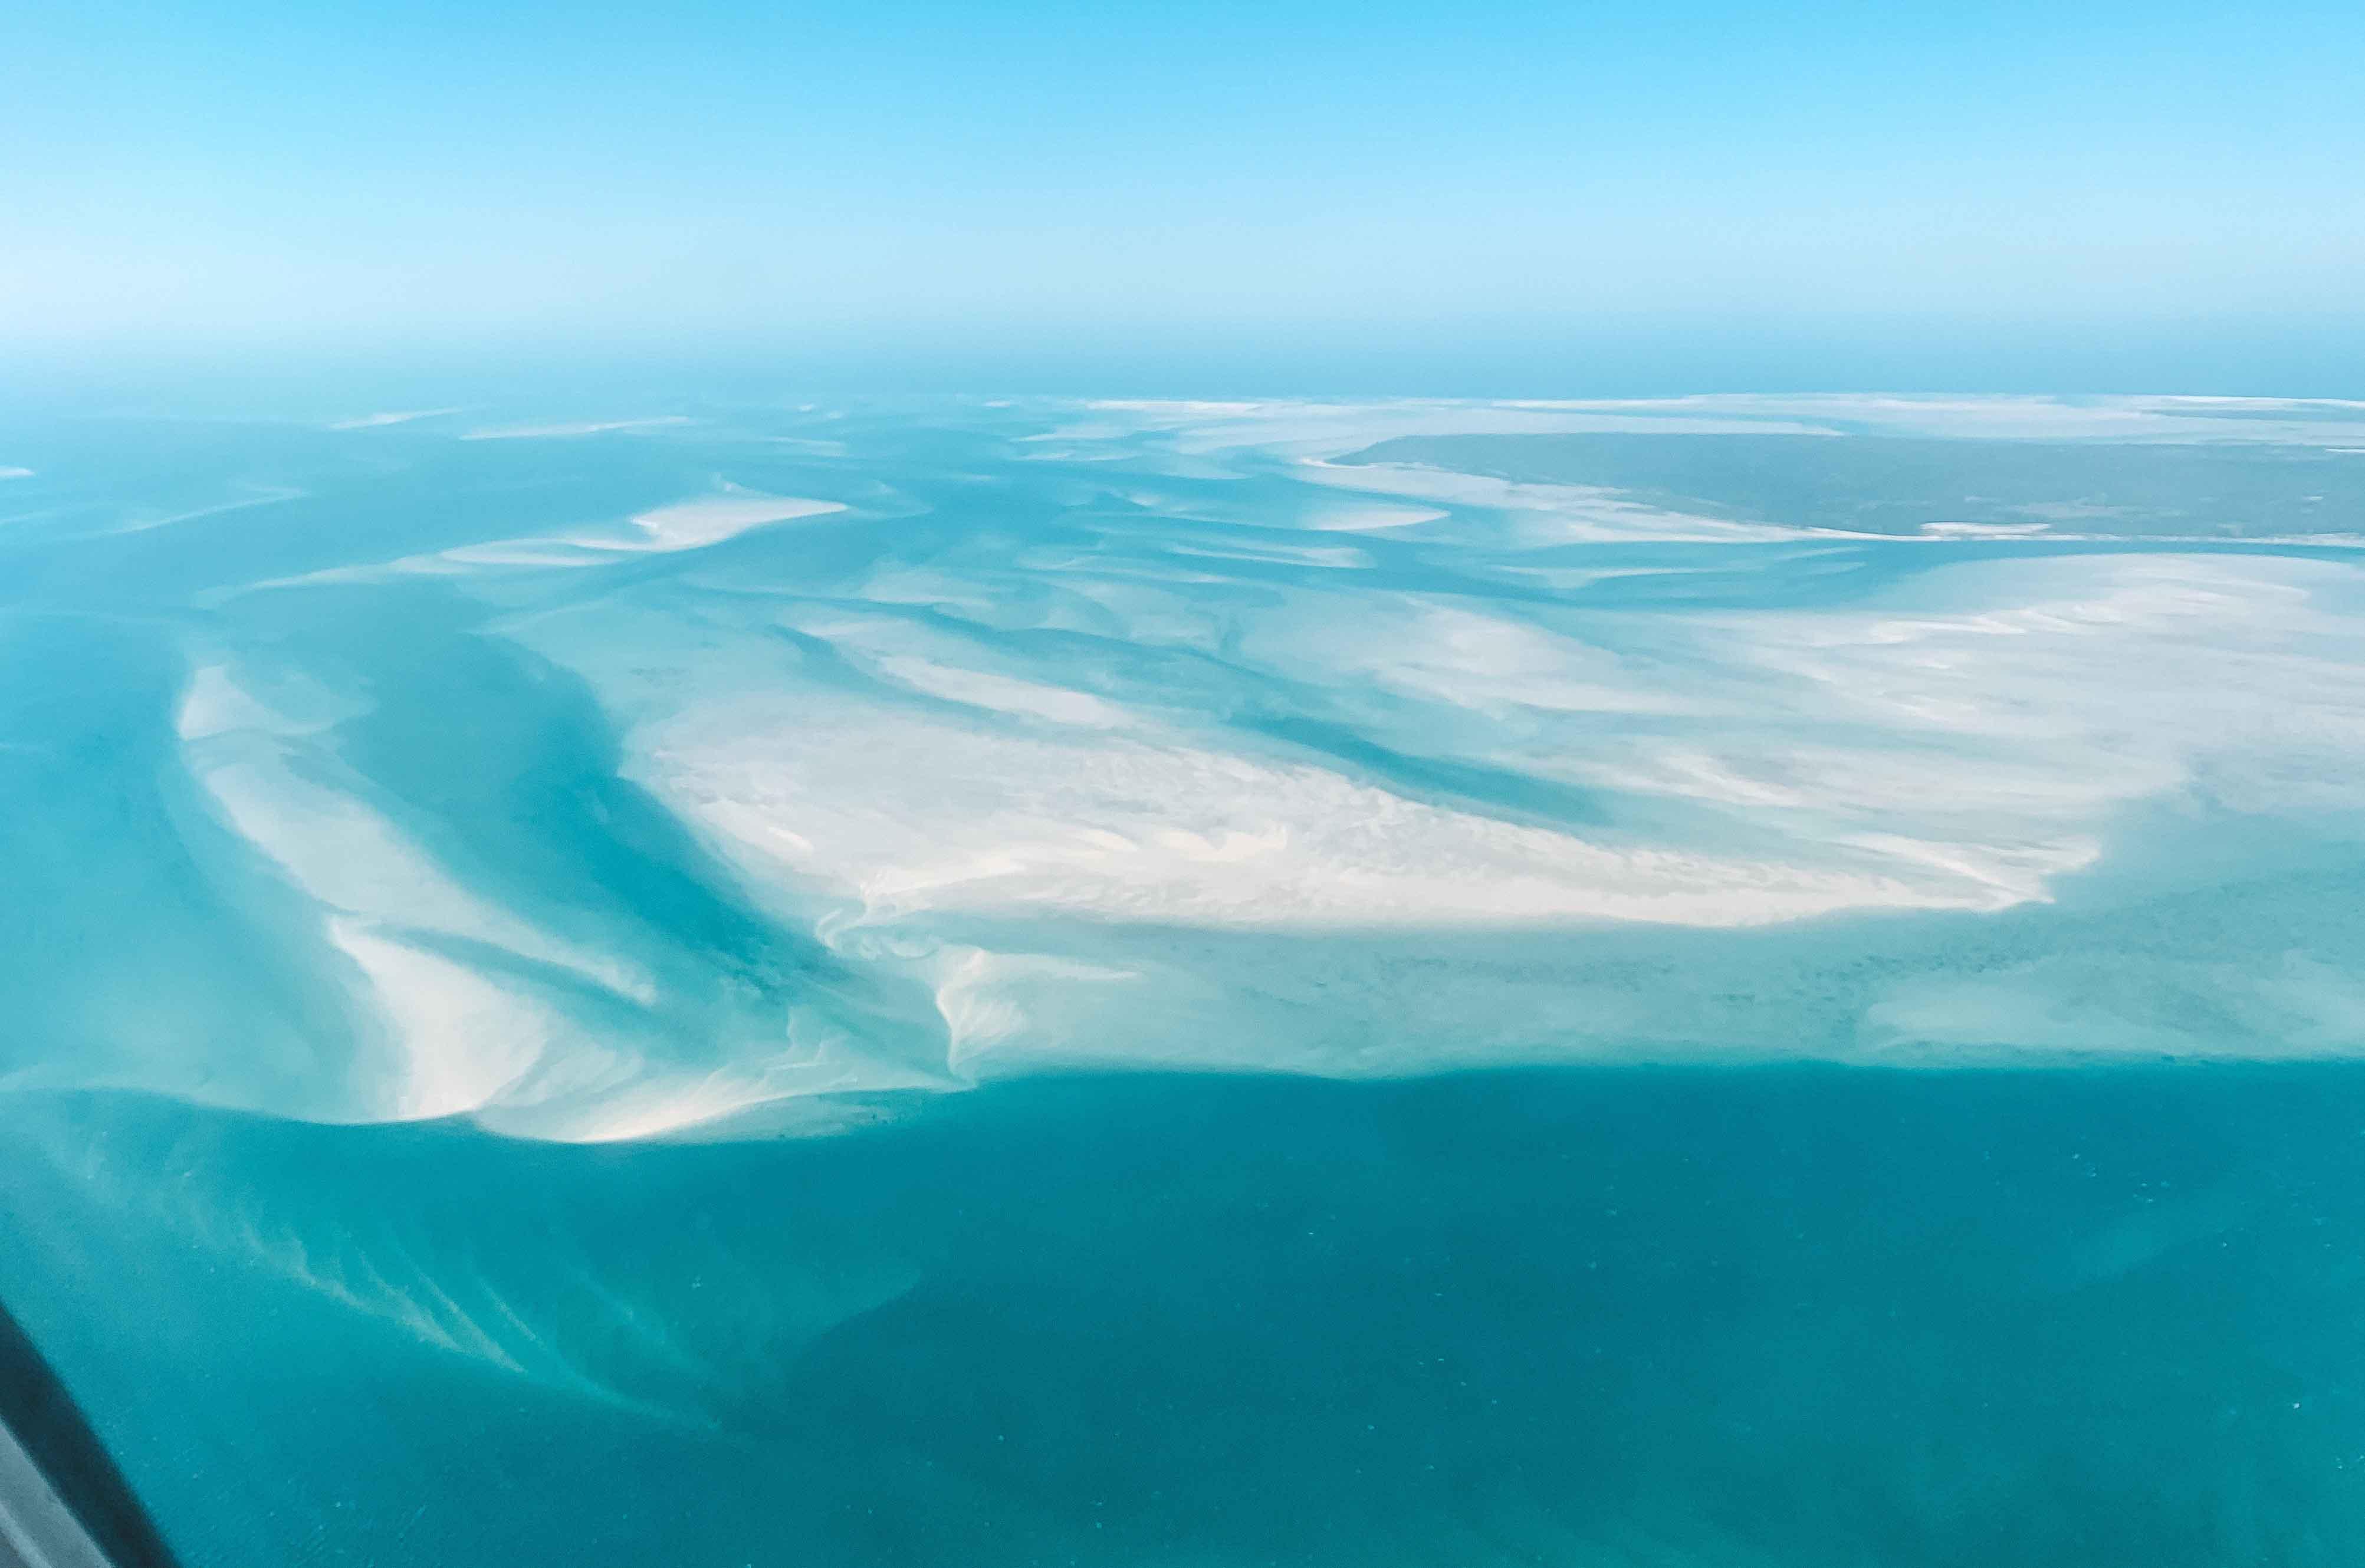 Arquipélago de Bazaruto - Vilanculos - Moçambique - praias ilhas África